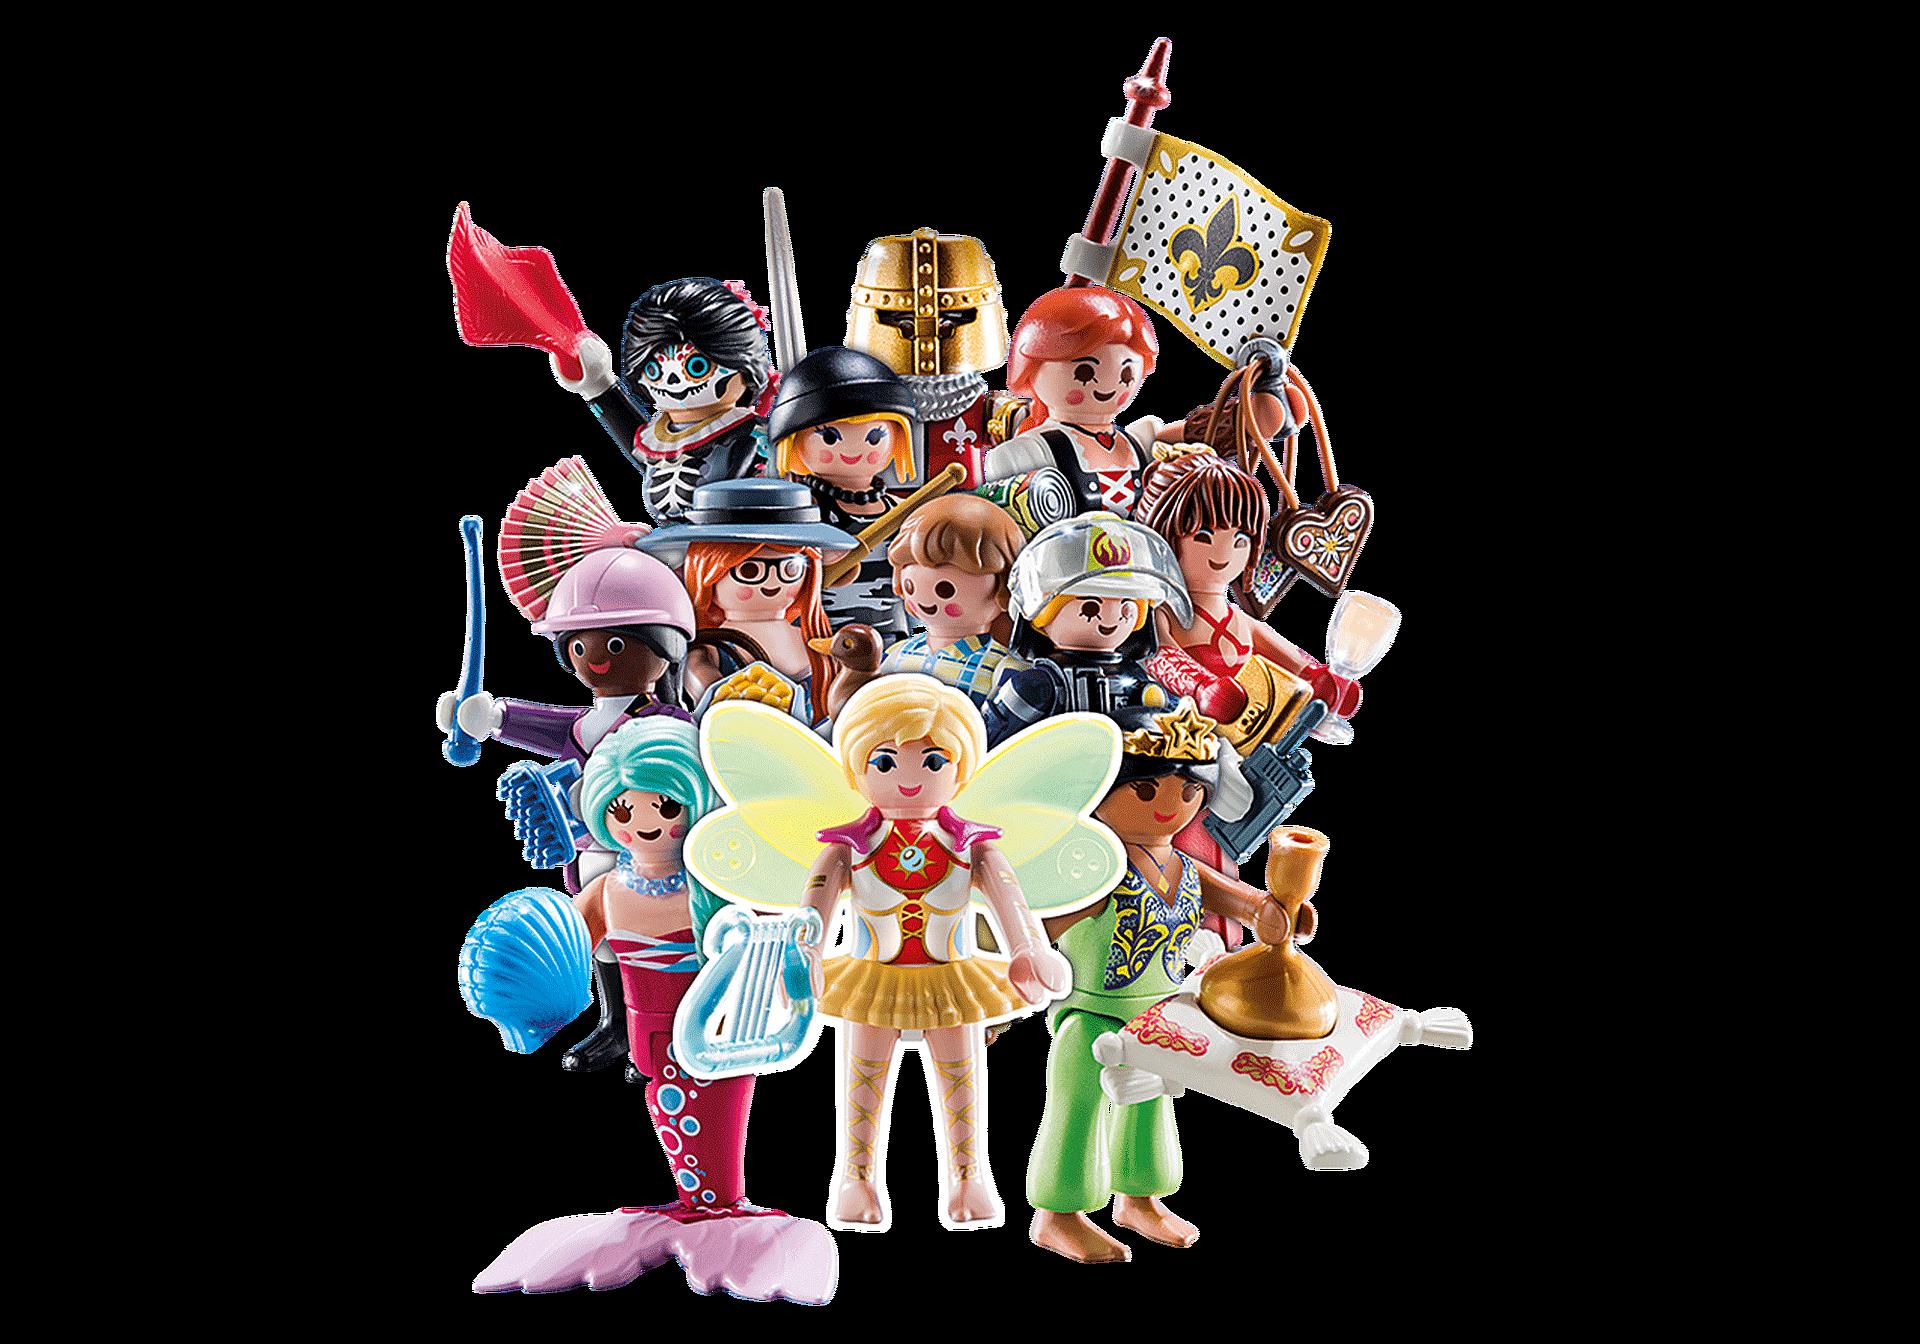 70149 PLAYMOBIL Figures Girls (Serie 20) zoom image1